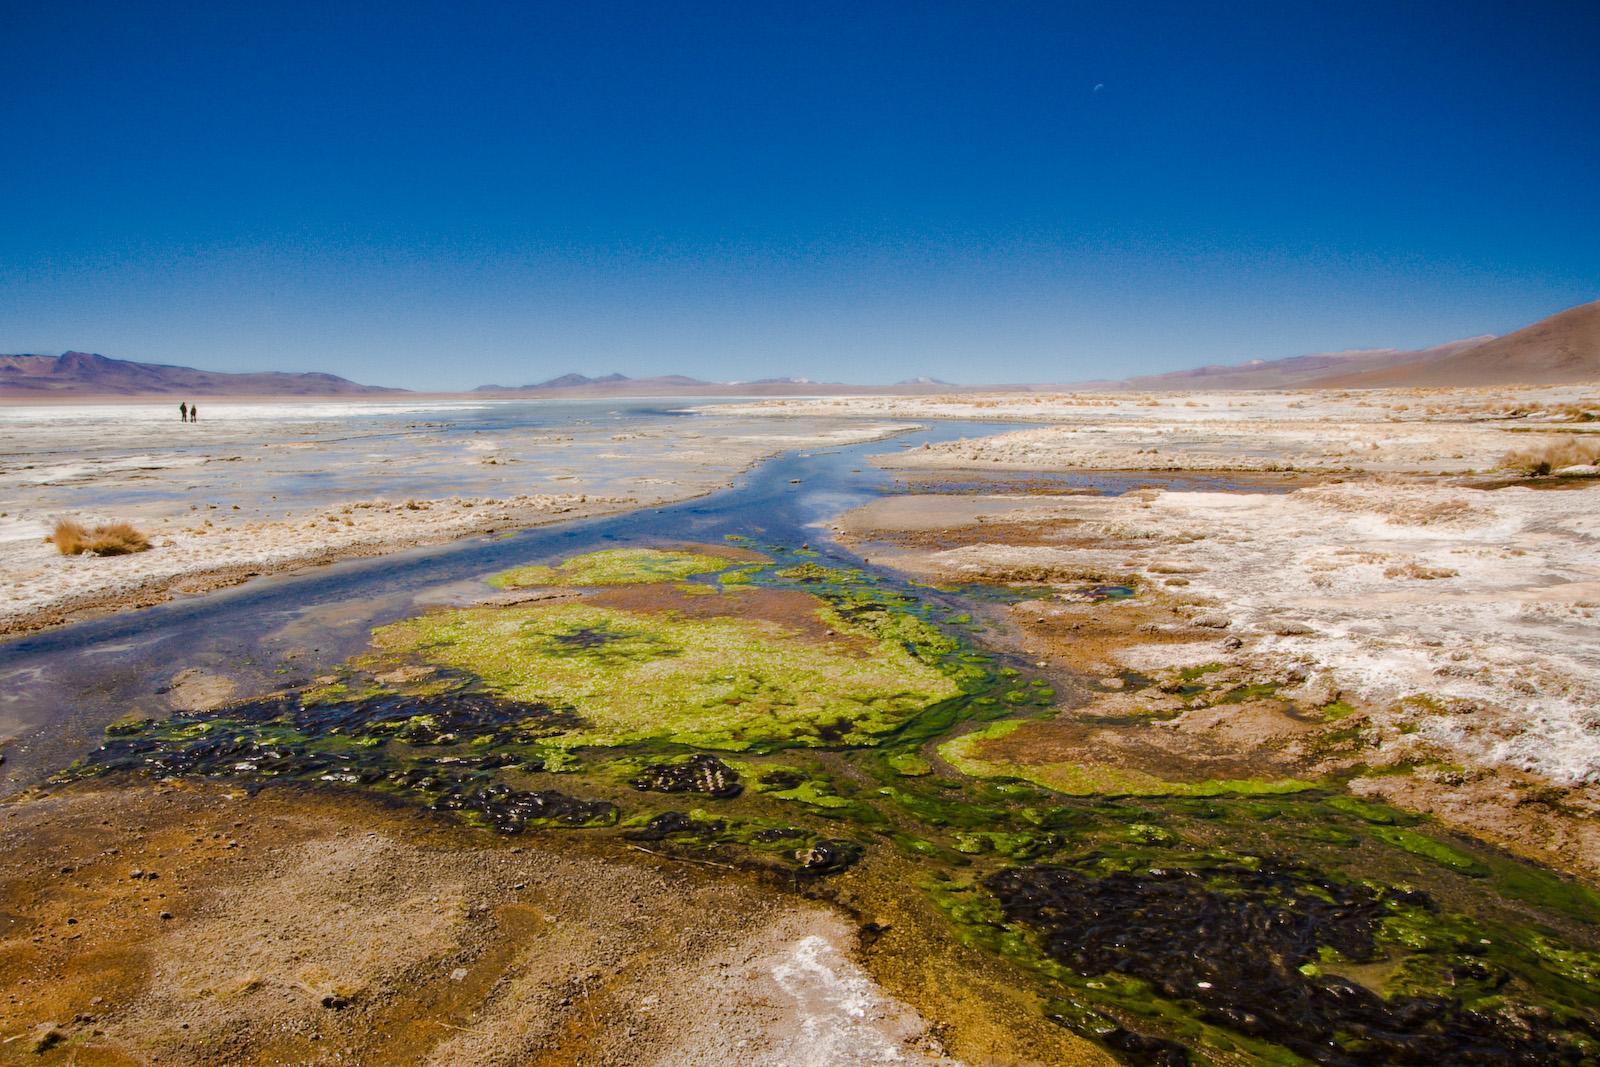 File:Laguna Blanca, Bolivia (2098873574).jpg - Wikimedia ...  File:Laguna Bla...